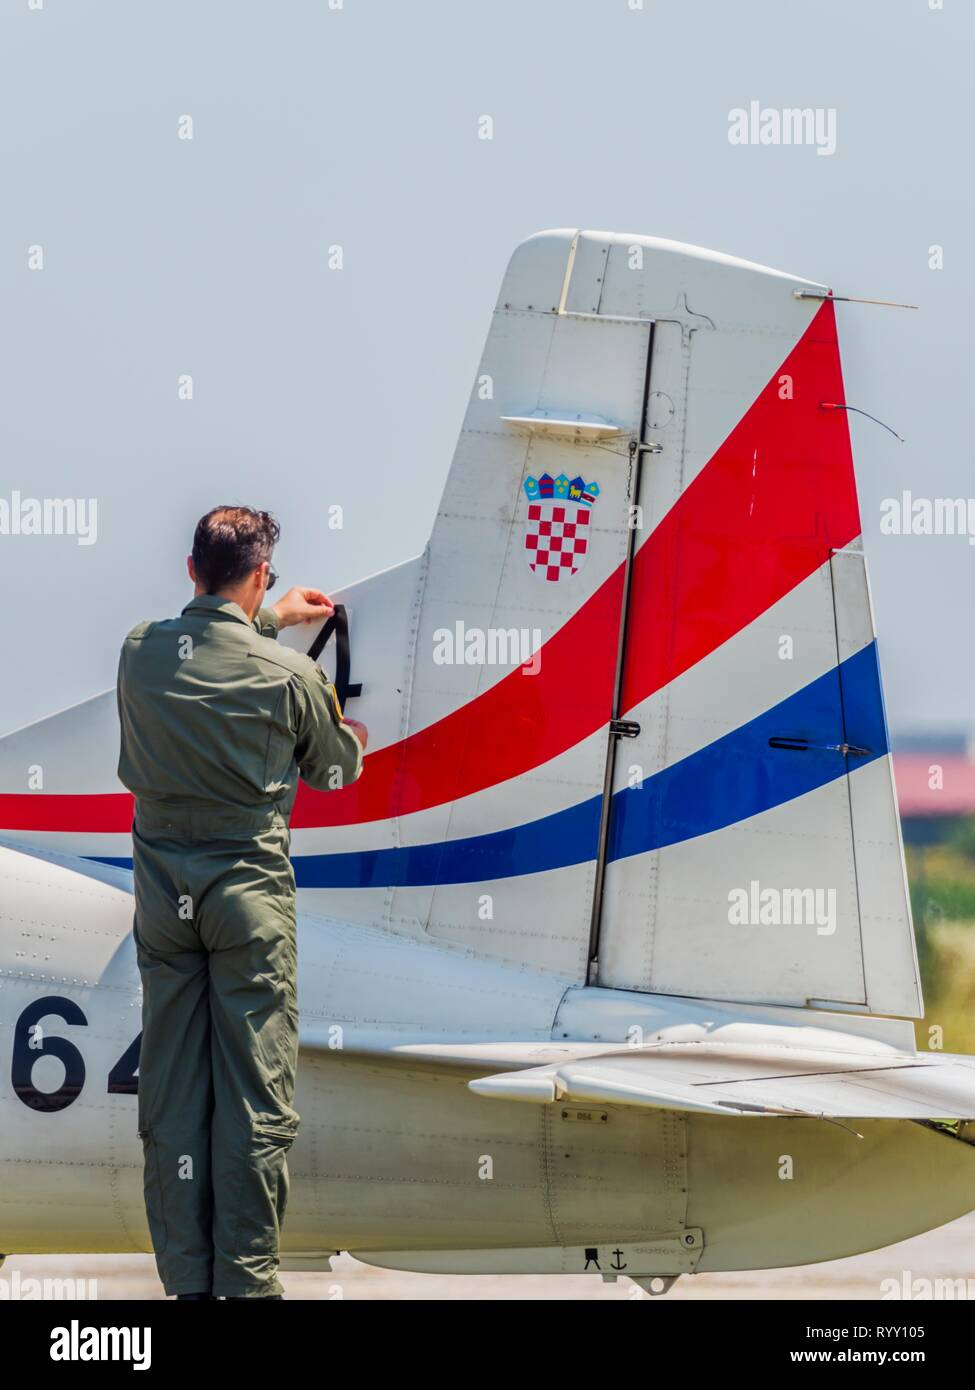 Pilatus PC9 PC-9 di Krila oluje ali di tempesta Foto Stock